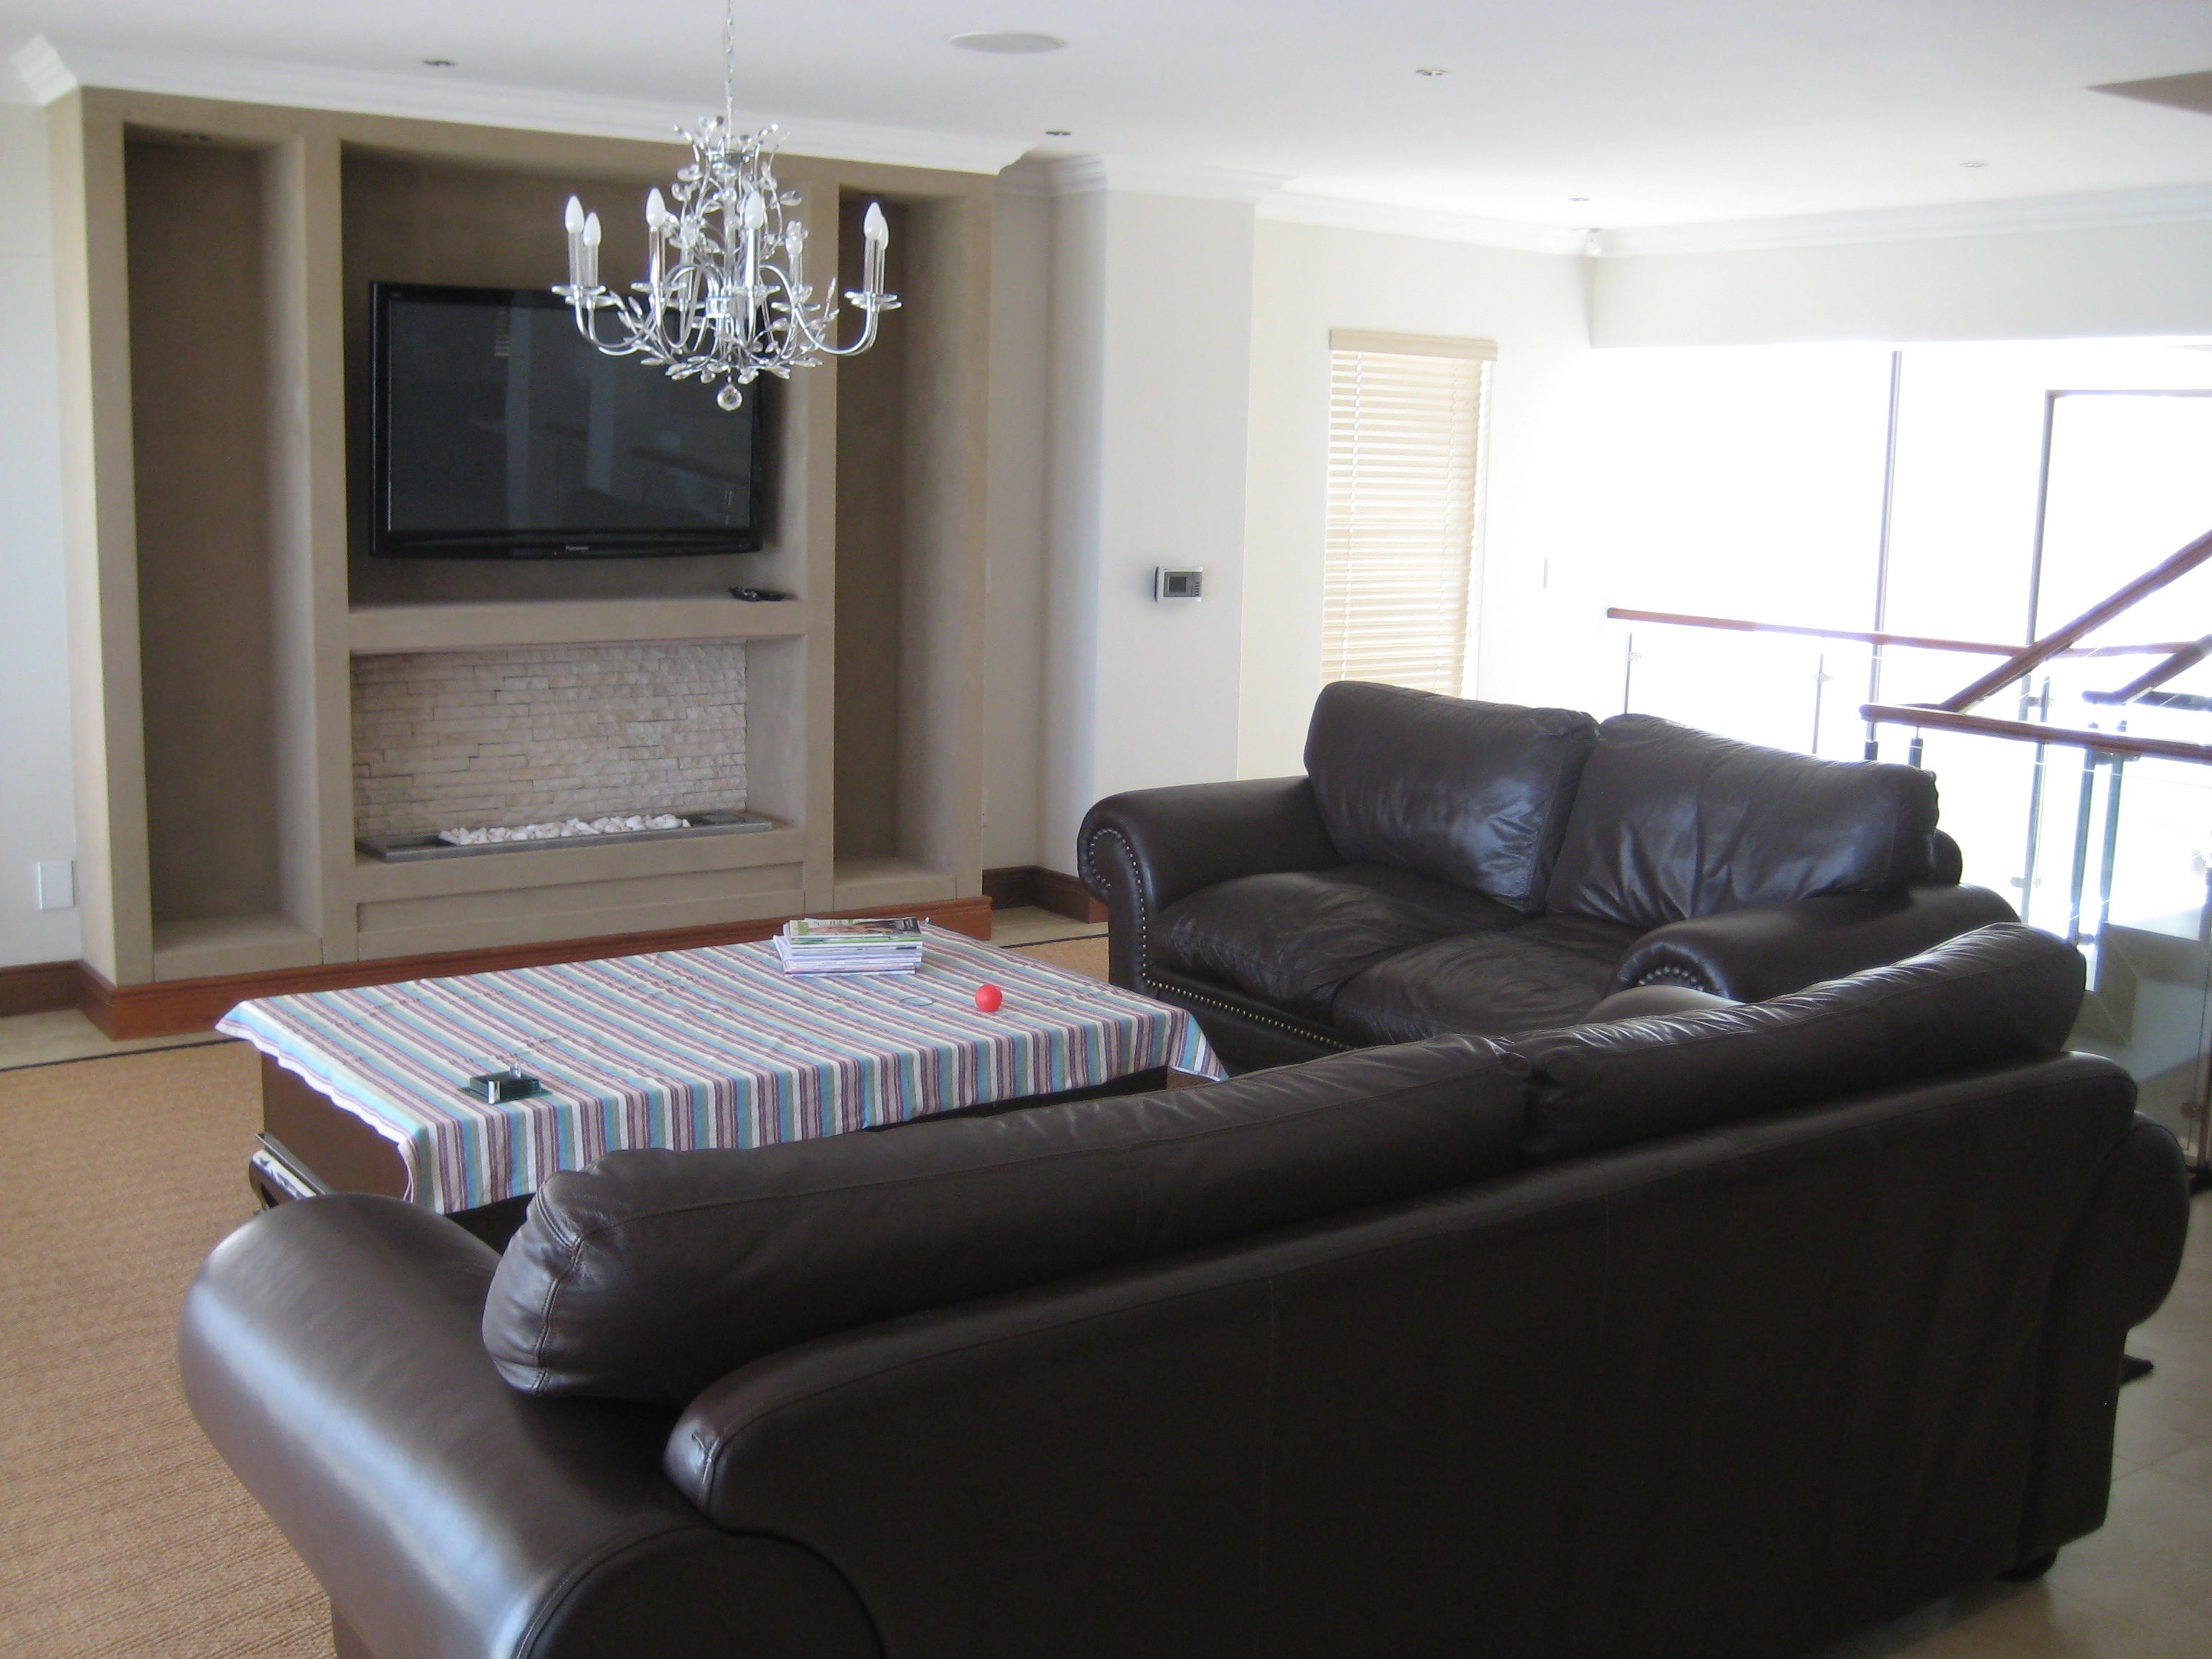 House Conradie - Calipso Beach, Langebaan - Kwali Mark Construction